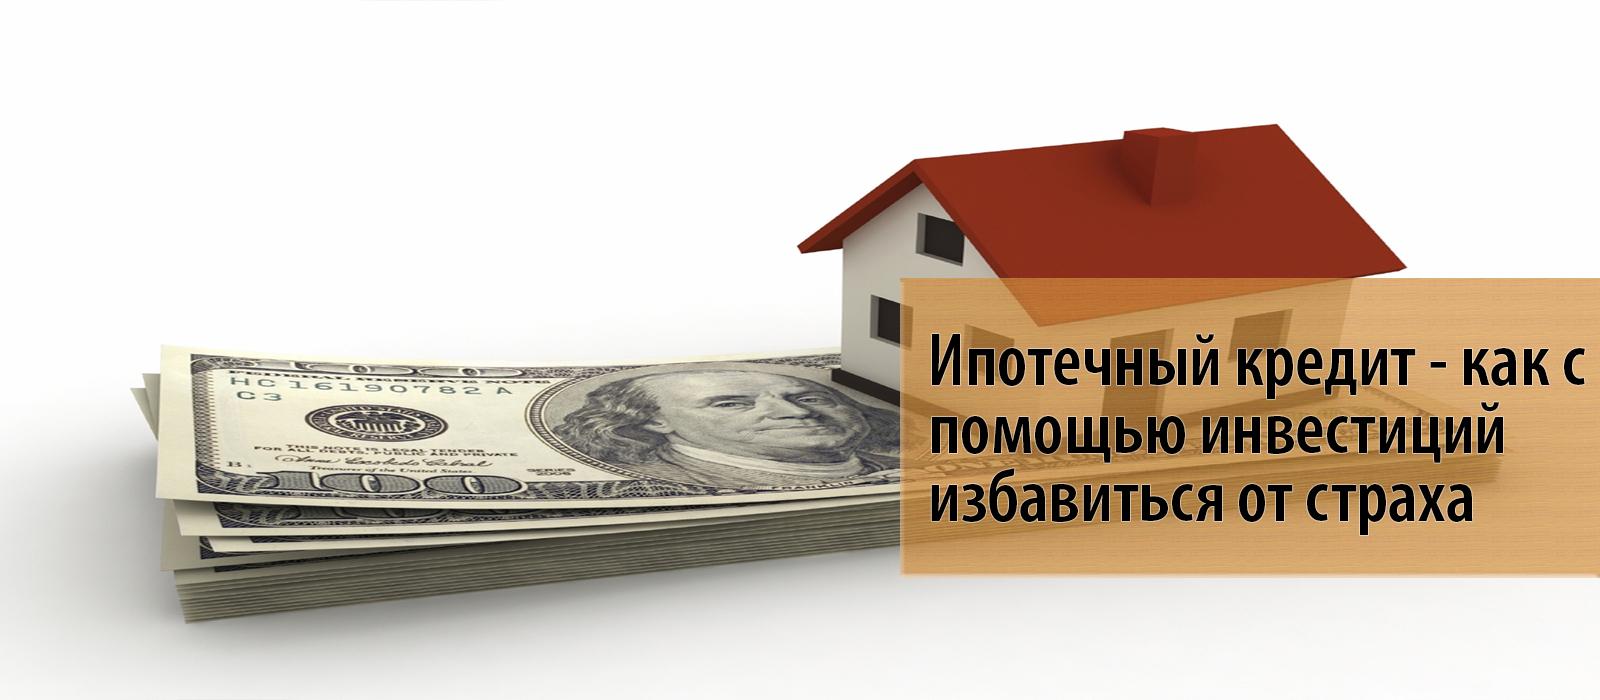 инвестиции с помощью ипотеки знал